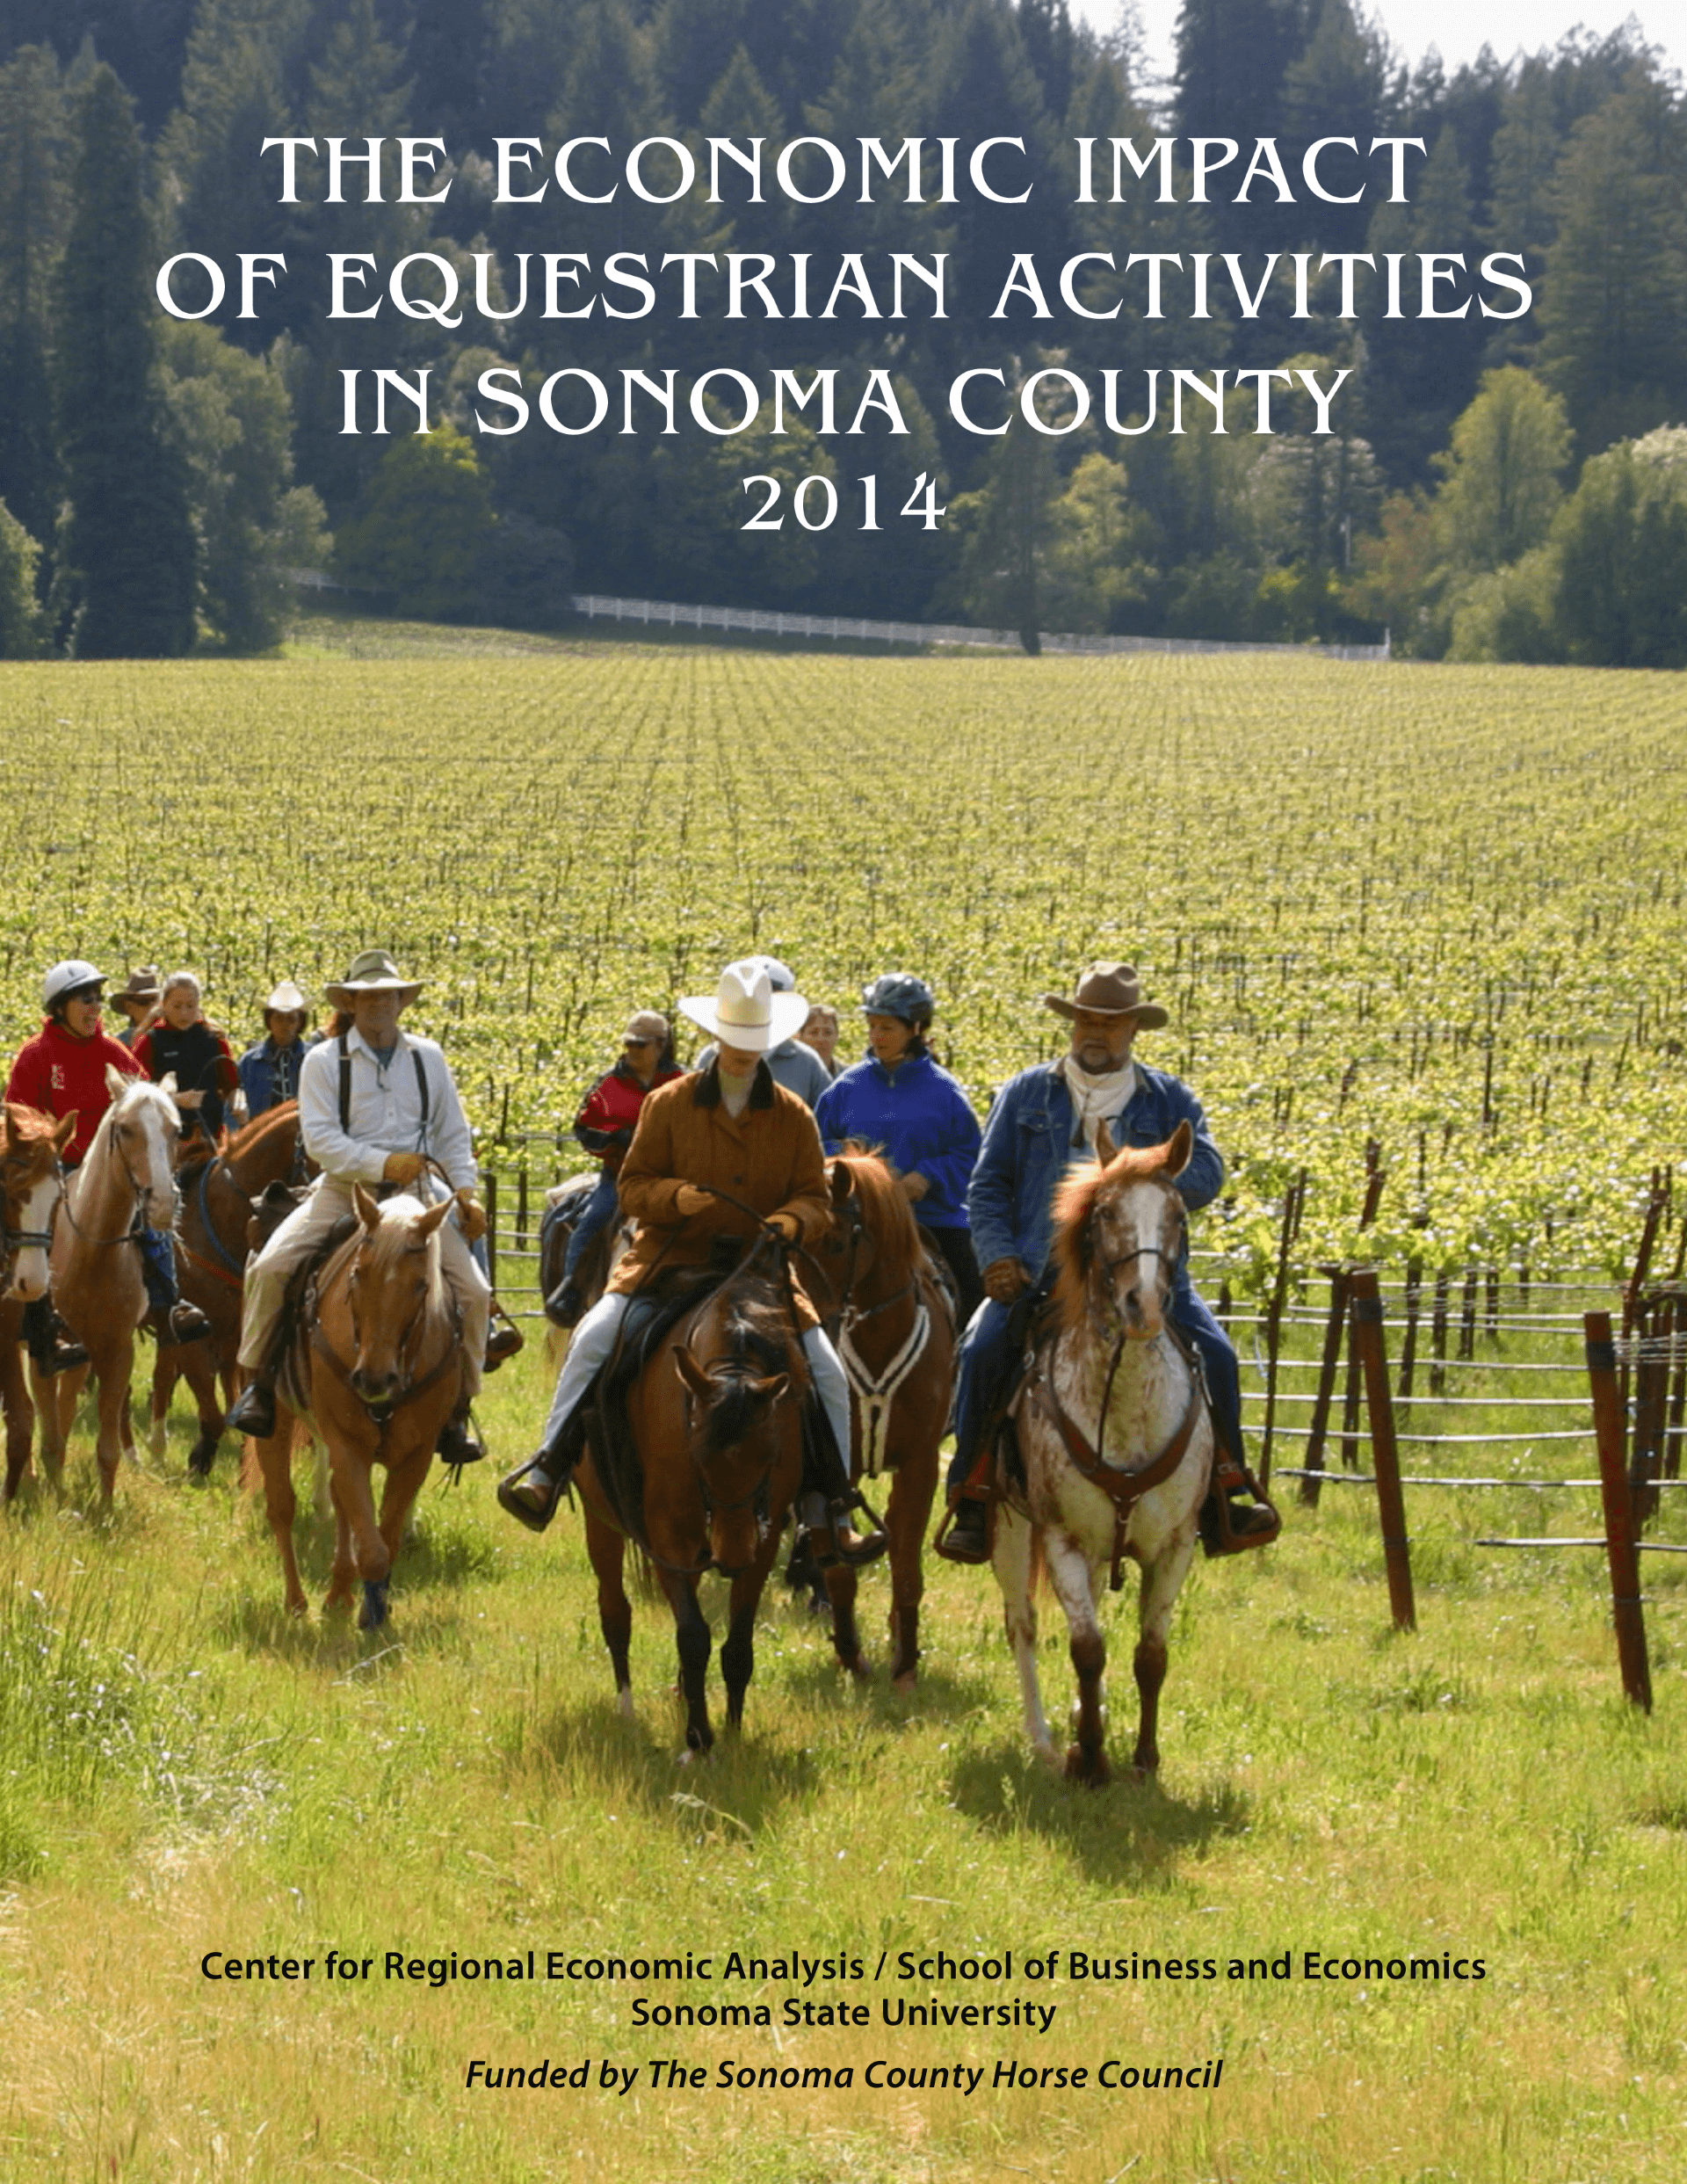 ECONOMIC IMPACT OF EQUESTRIAN ACTIVITIES IN SONOMA COUNTY